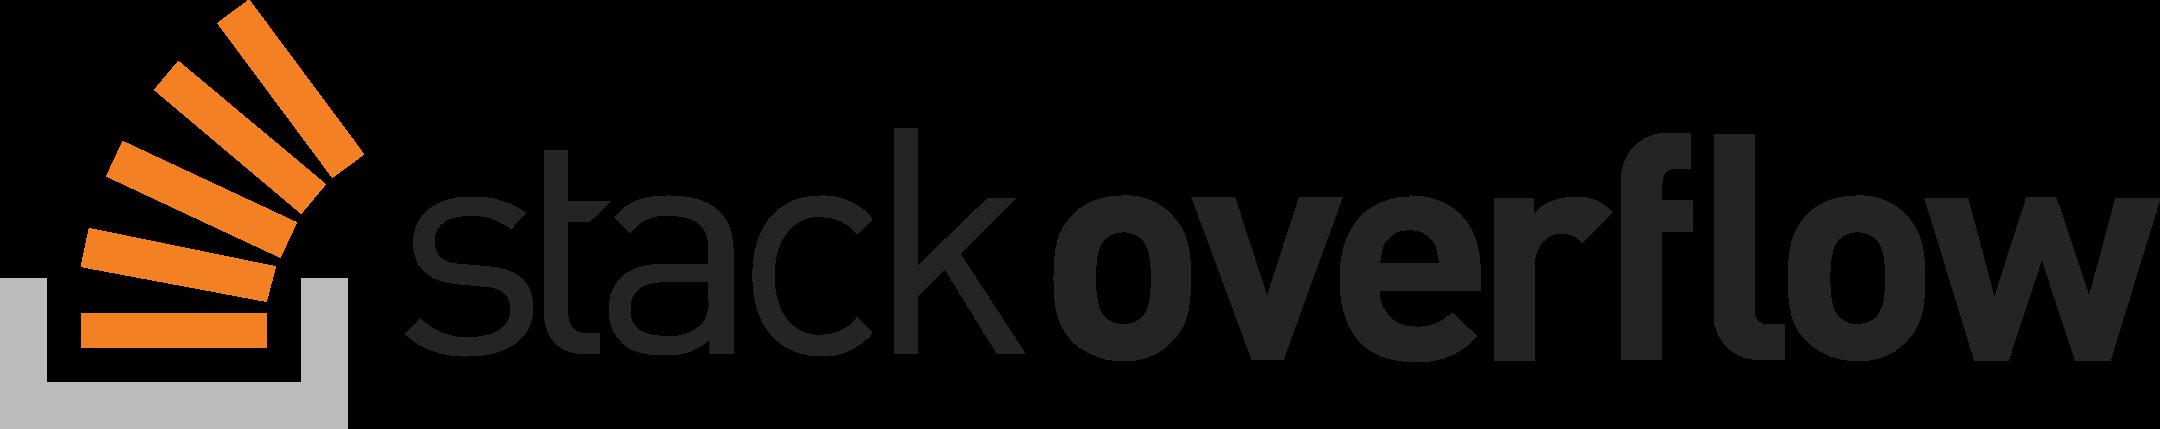 stack overflow logo 1 - Stack Overflow Logo